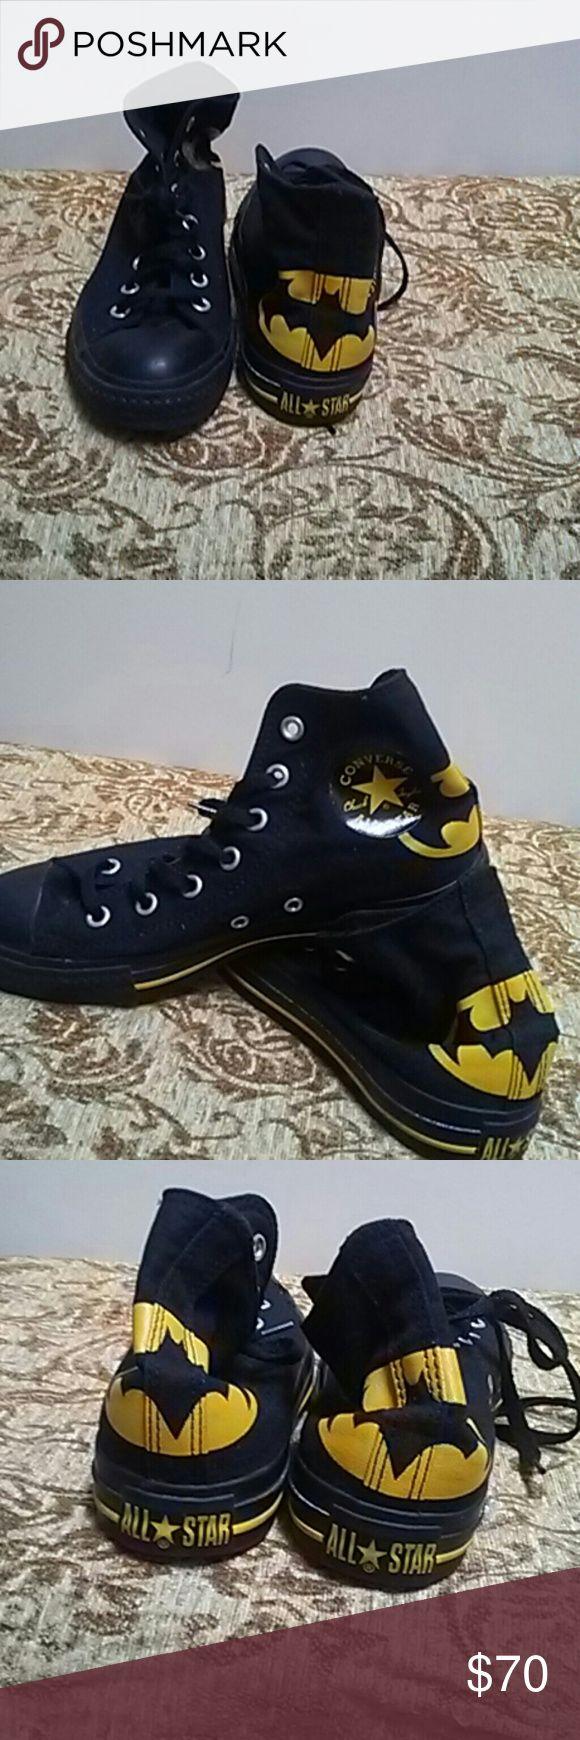 EUC custom batman hightop converse mens 6 EUC custim batman chucks mens 6 womens 8-8.5 Converse Shoes Sneakers